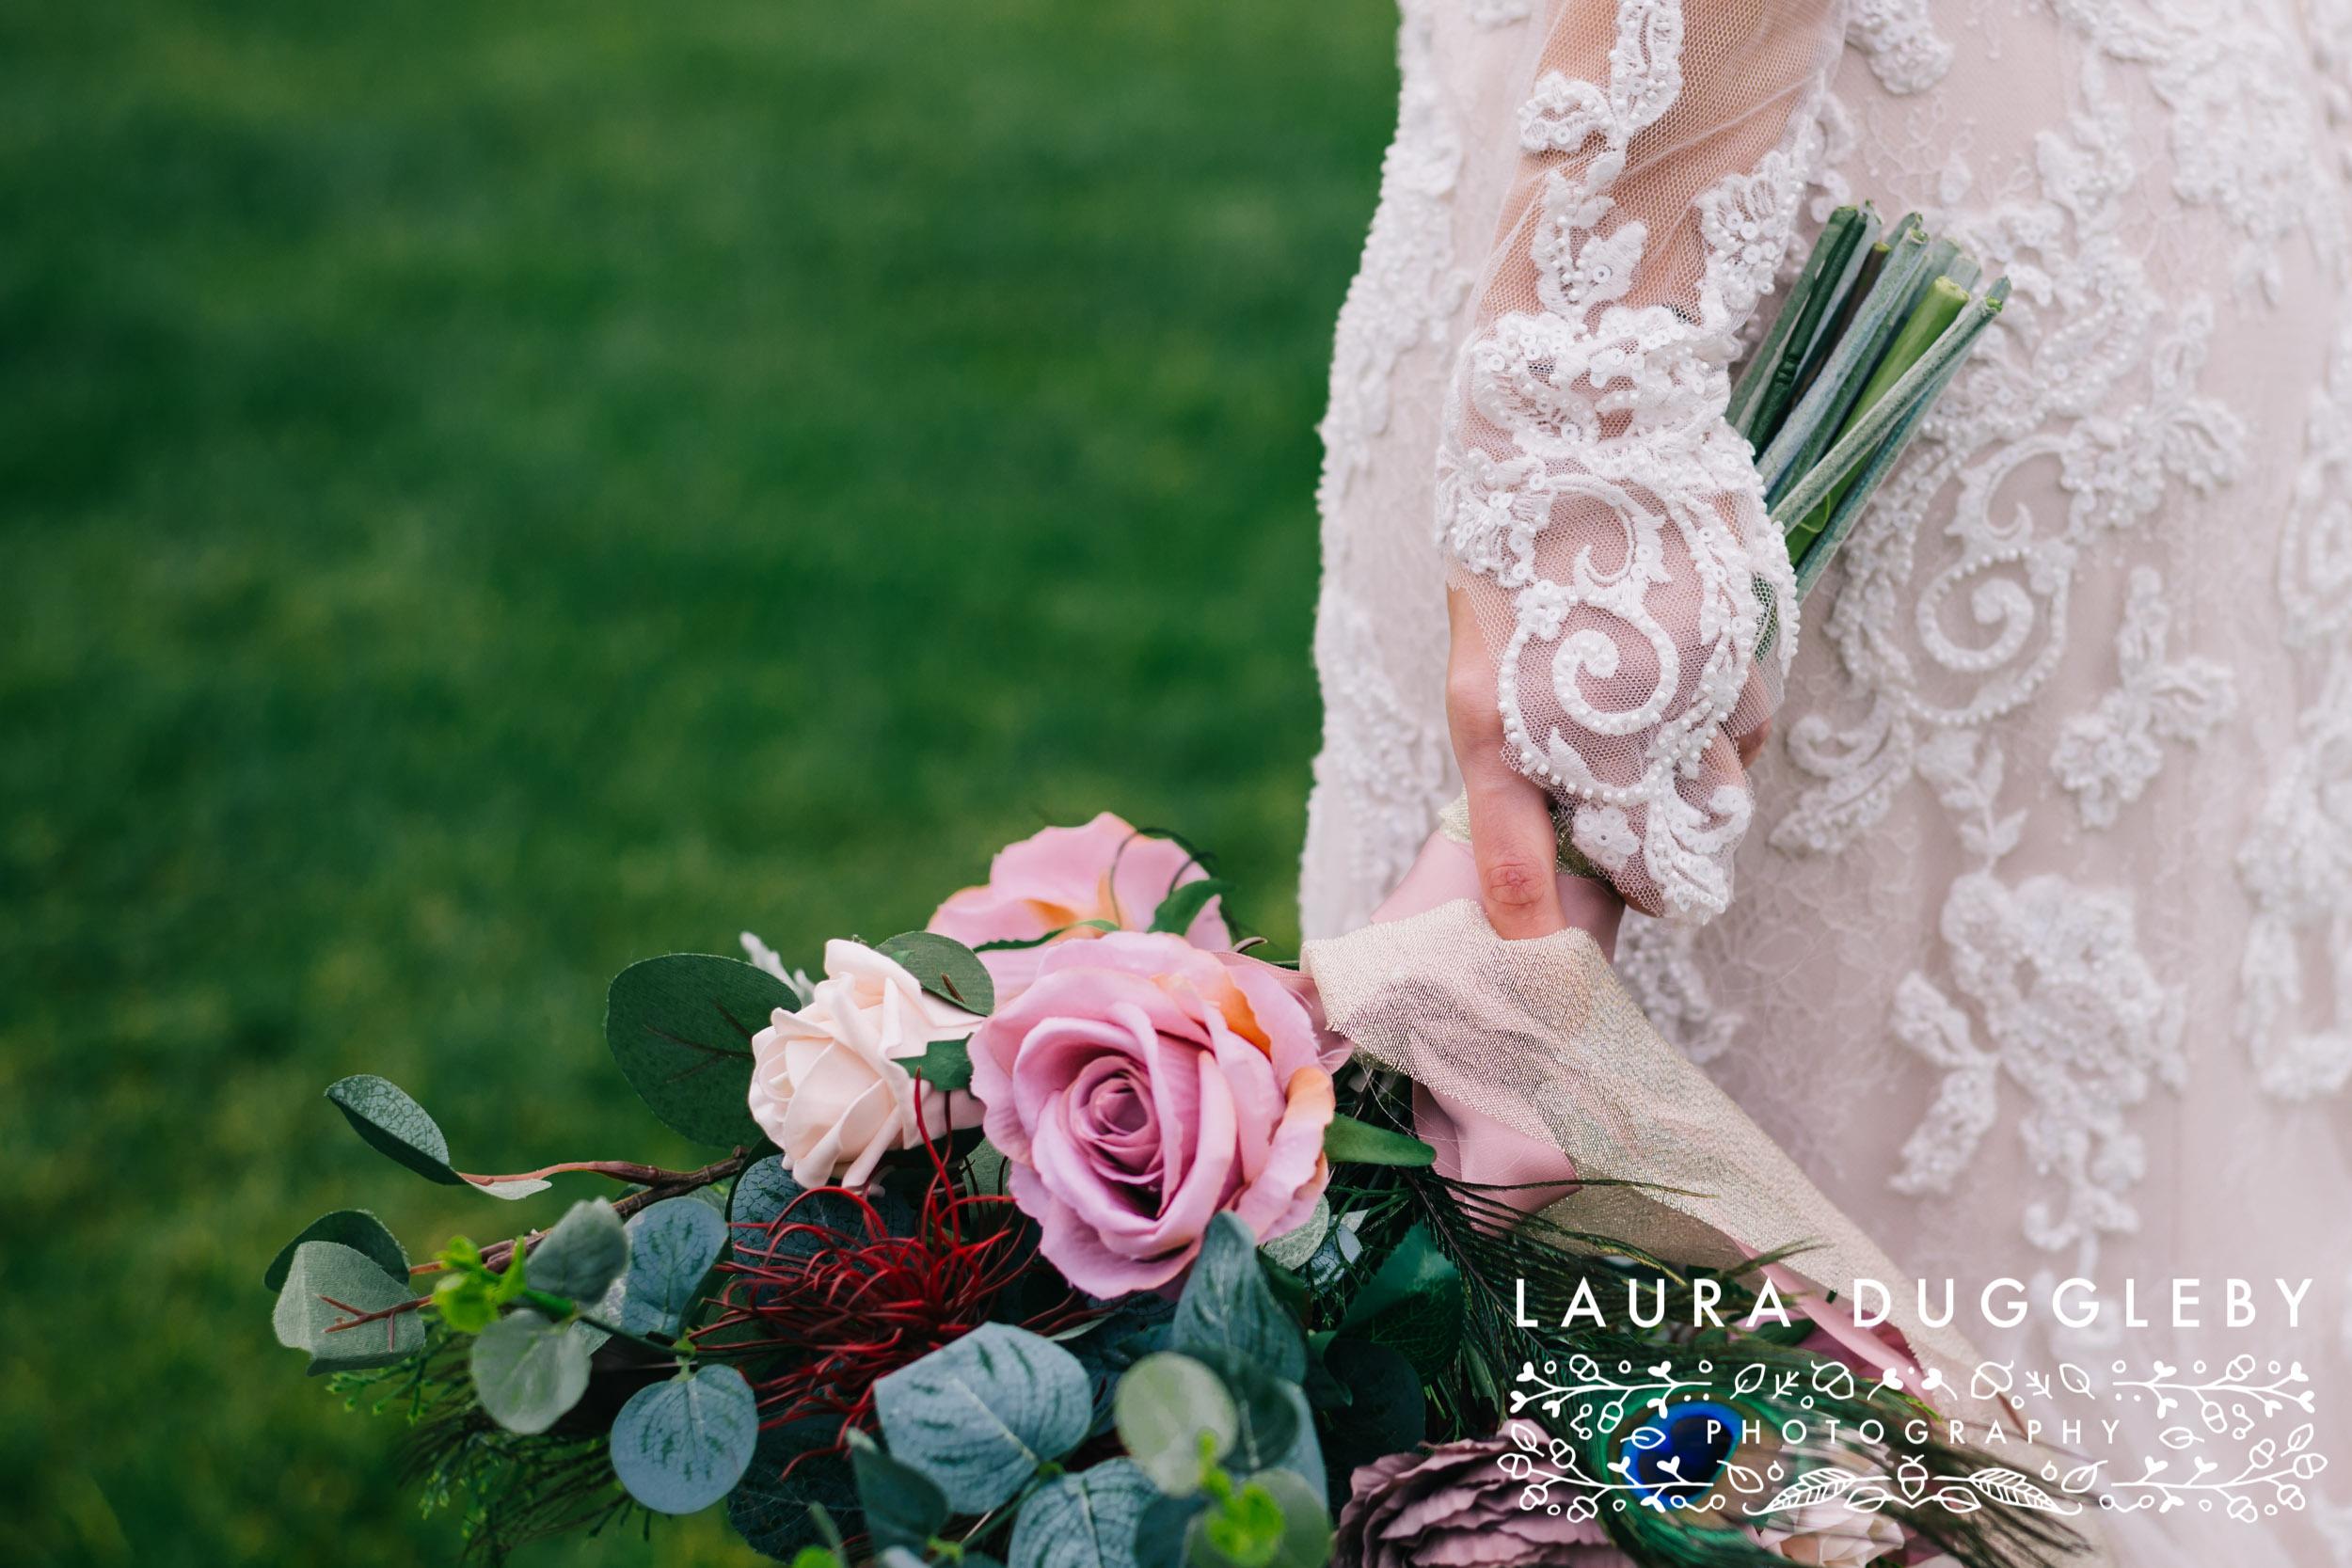 Skipton Wedding Photographer - Thornton Hall Country Park Wedding Photographer2